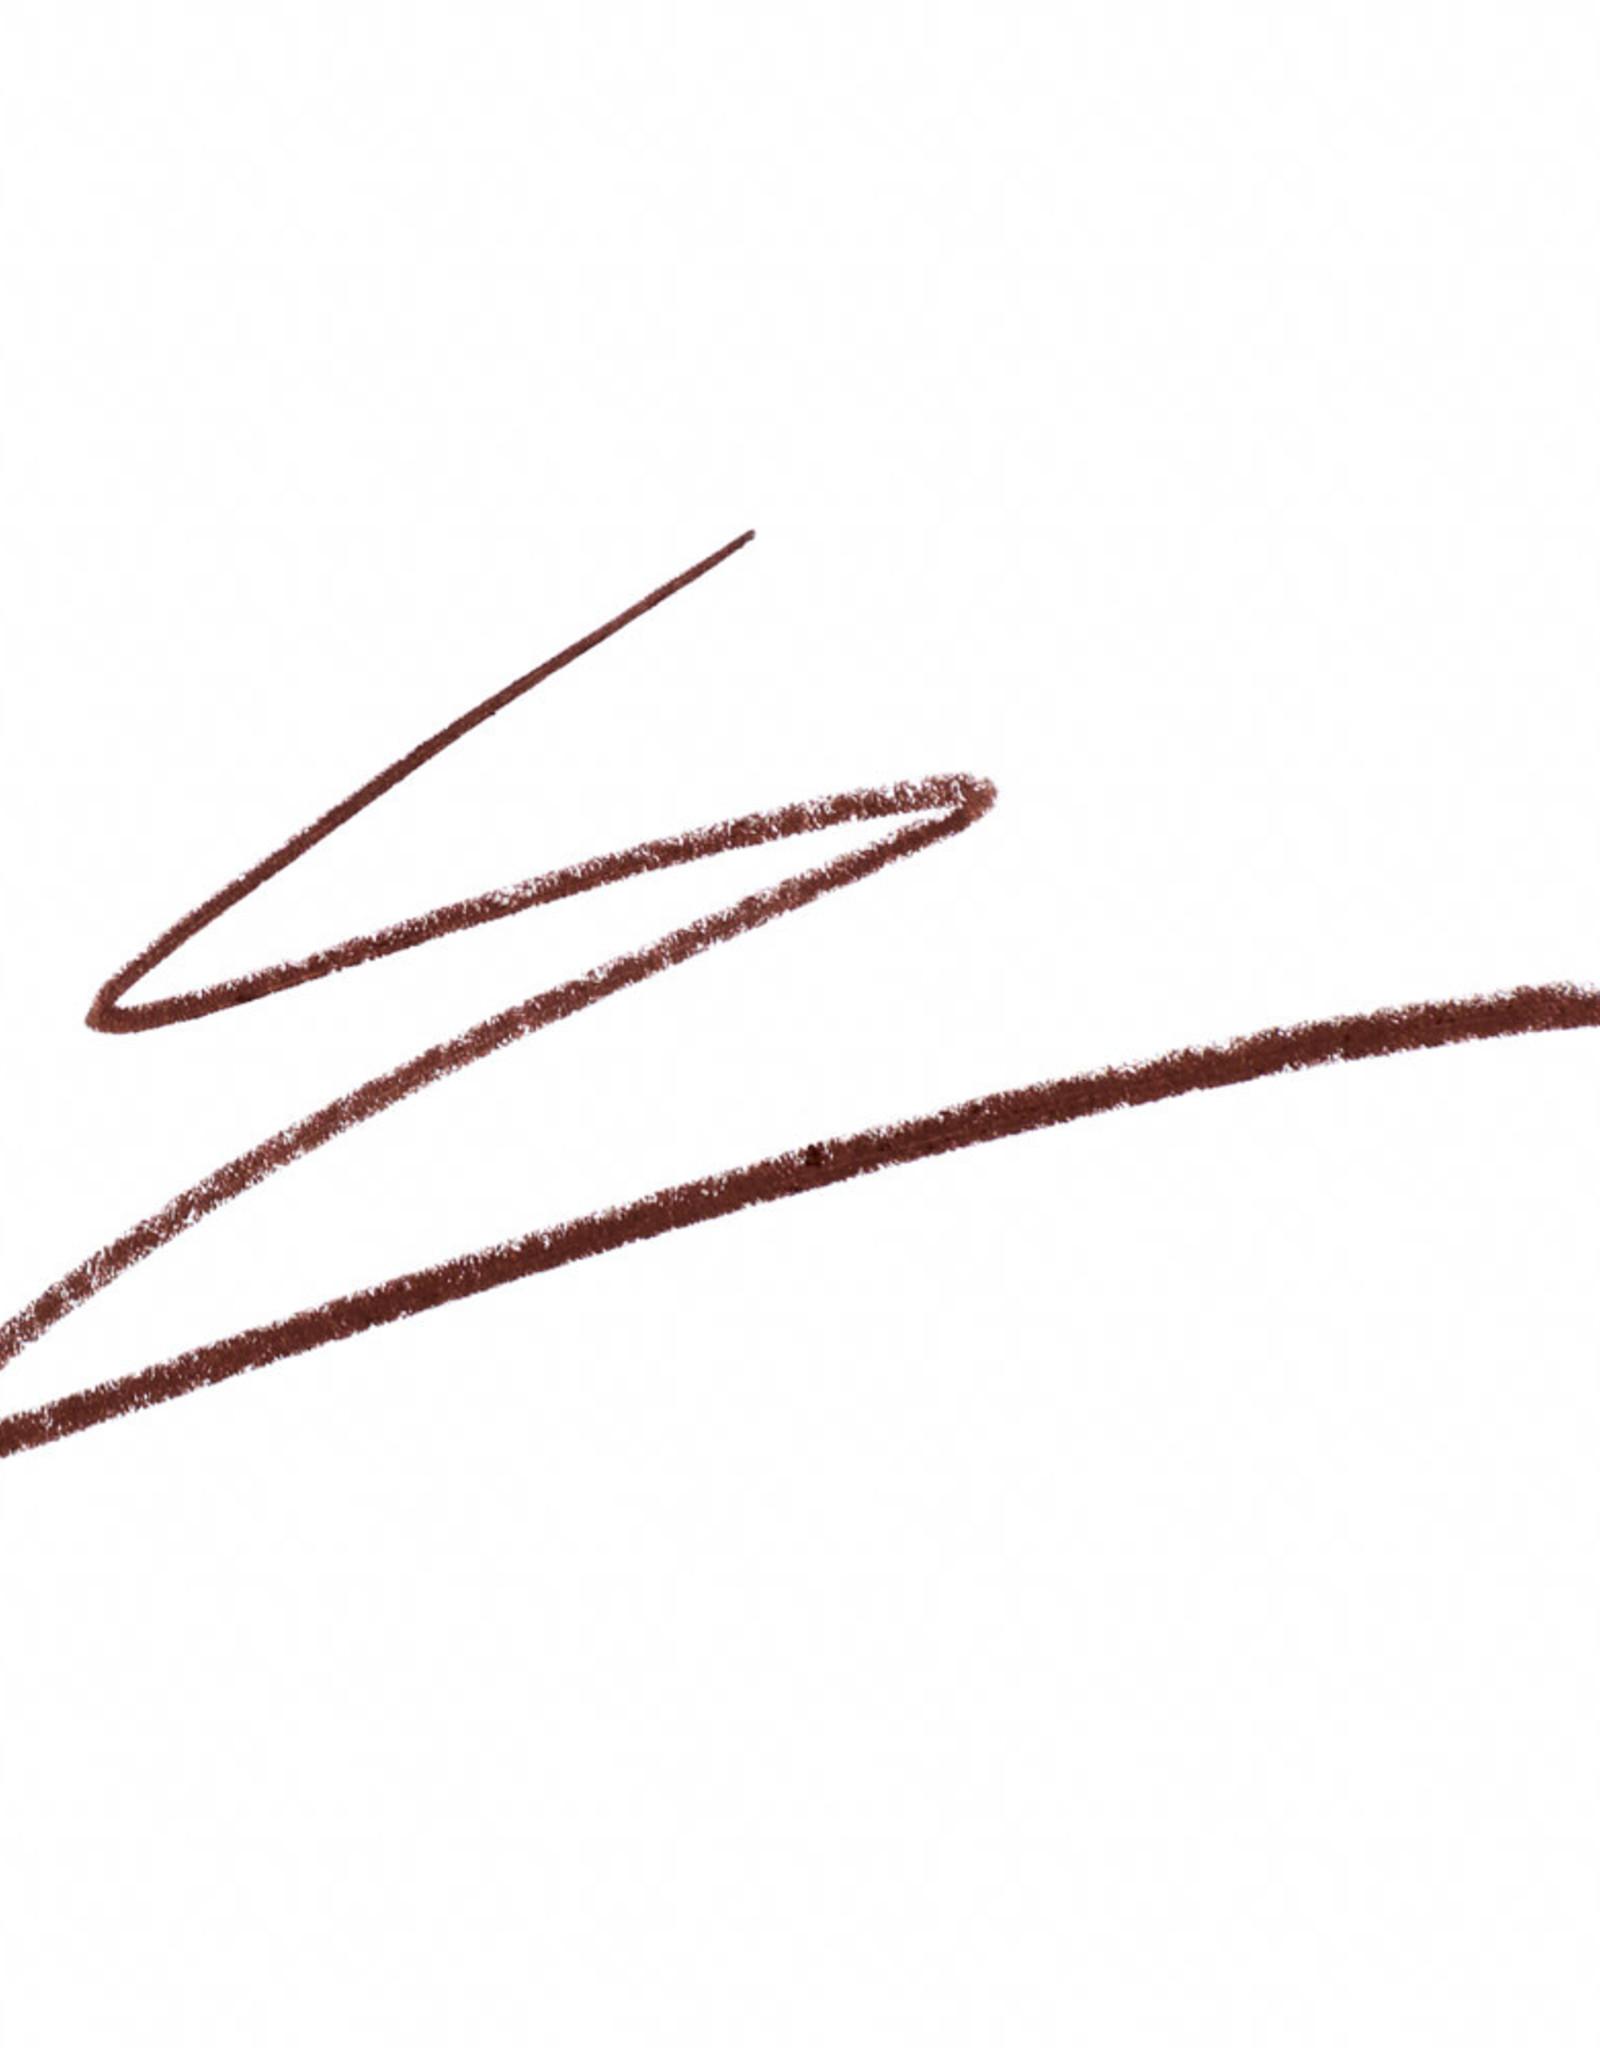 Ben Nye LIP COLR PENCIL, FRENCHROAST, .065 OZ